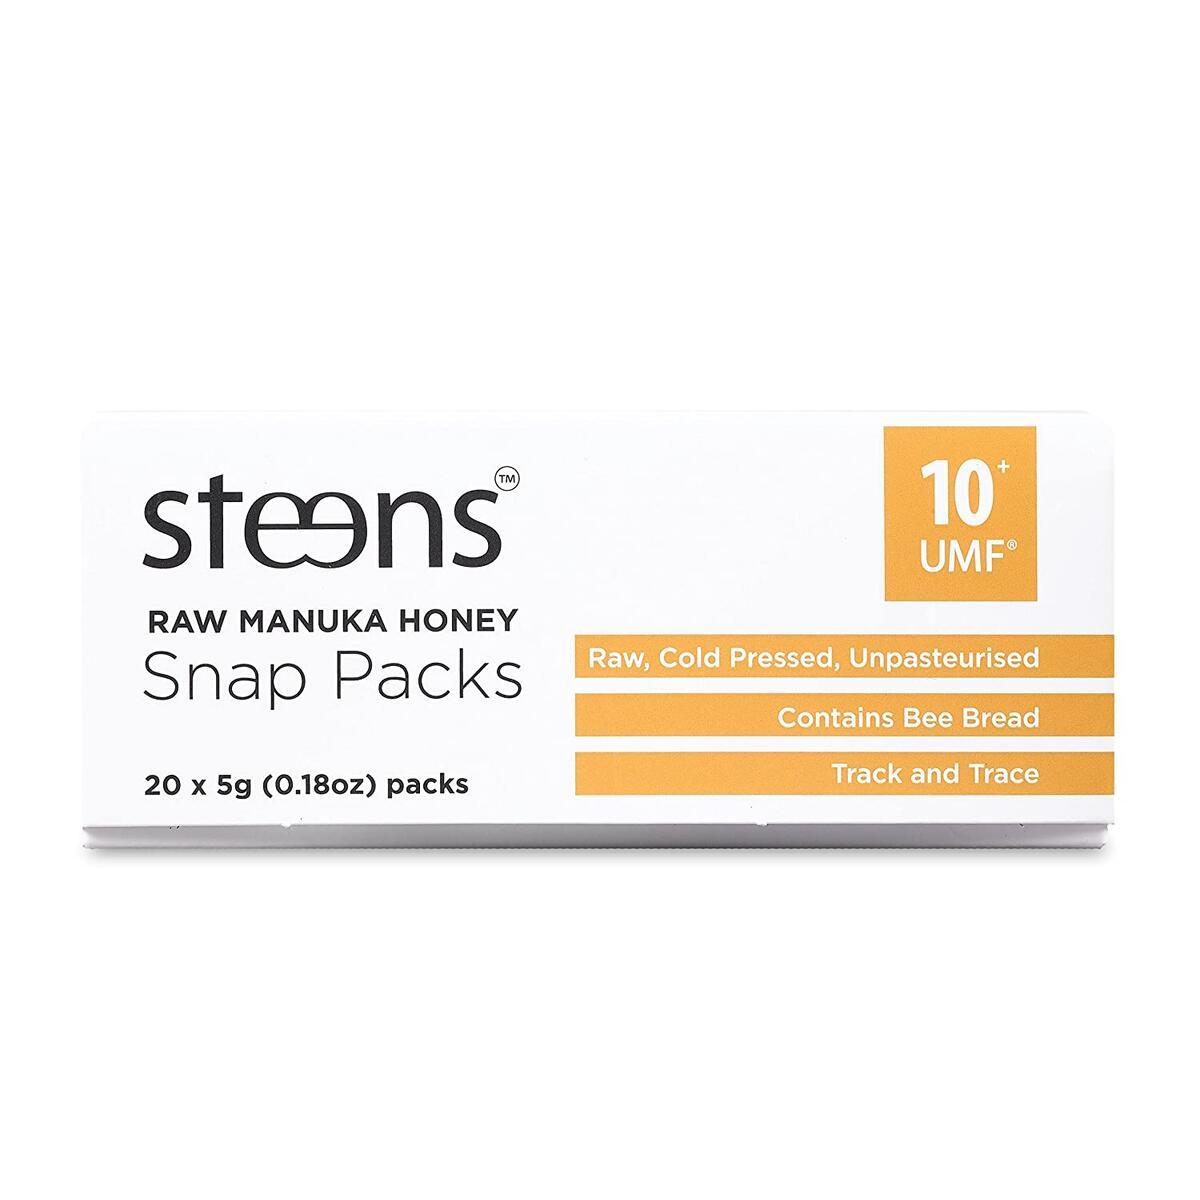 Steens UMF 10 (MGO 263) Raw Unpasteurized NZ Manuka Honey (3.5 Ounce) 20 Packets of 0.17 oz